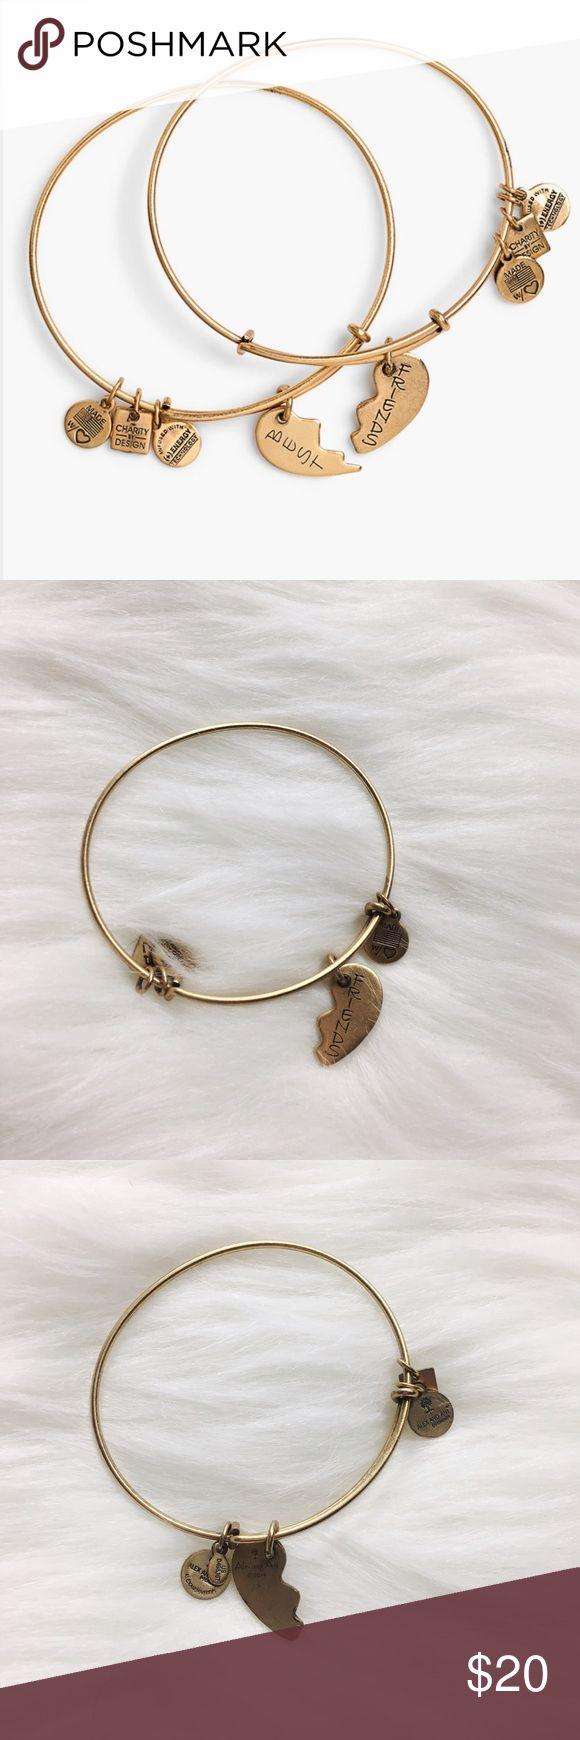 "Alex + Ani ""Best Friends"" ""Friend"" Bracelet Alex + Ani ""Best Friends"" ""Friend"" Bracelet. Only the ""Friend"" half in gold. Excellent condition. No trades. Alex & Ani Jewelry Bracelets"